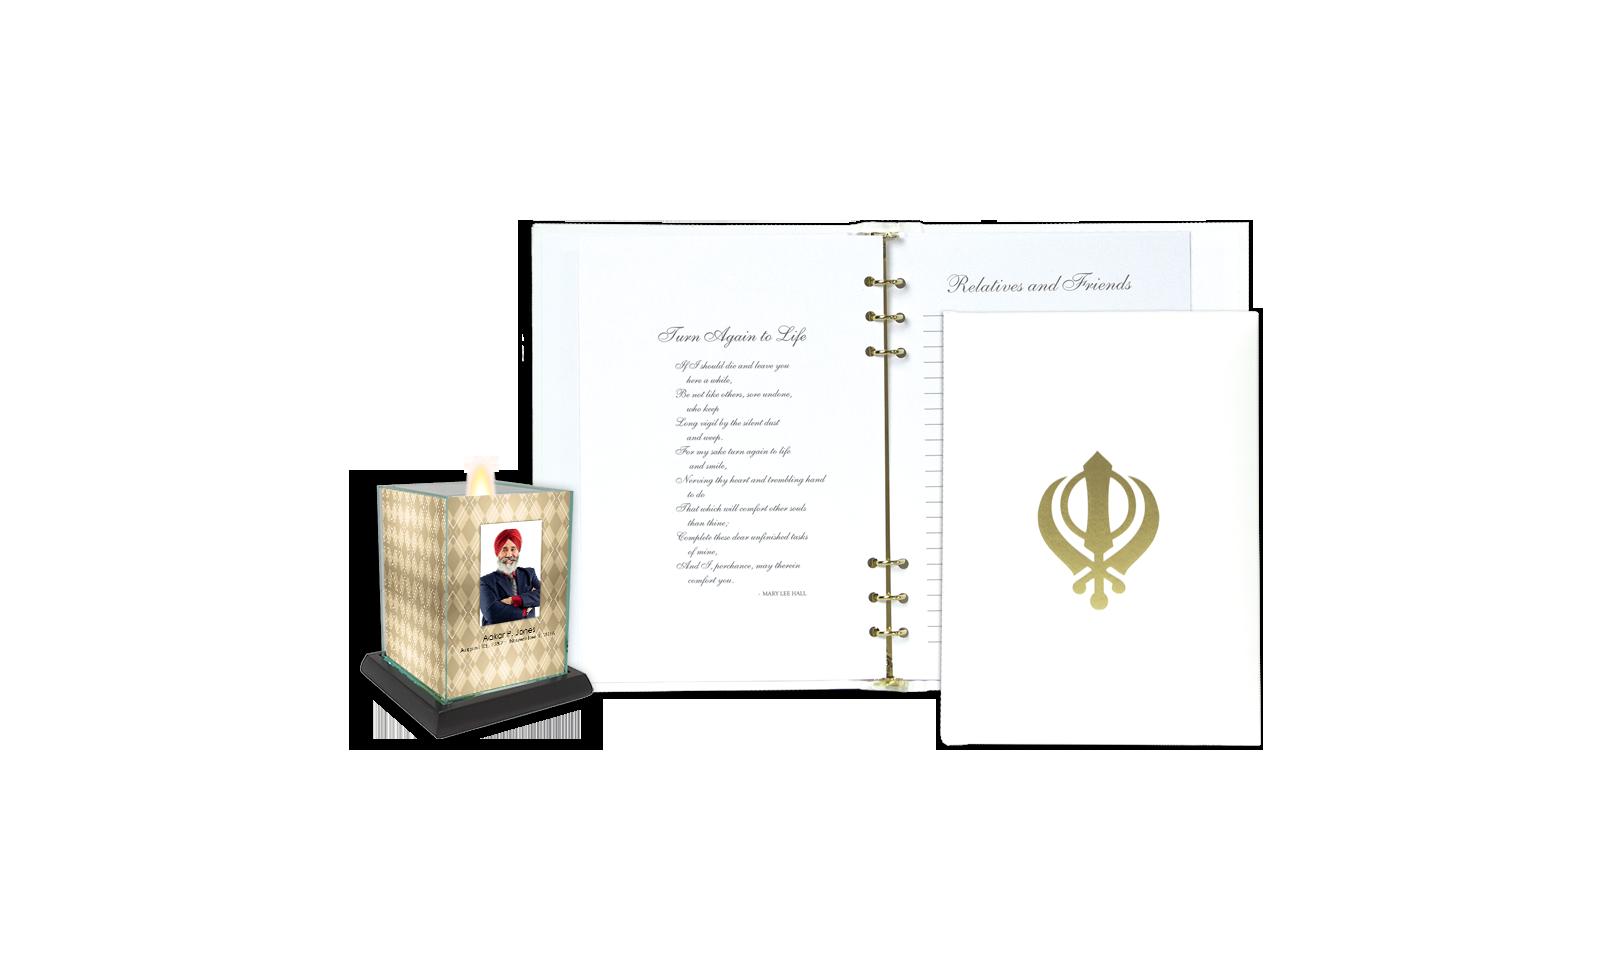 ROL Sikhism Series 456 SIK